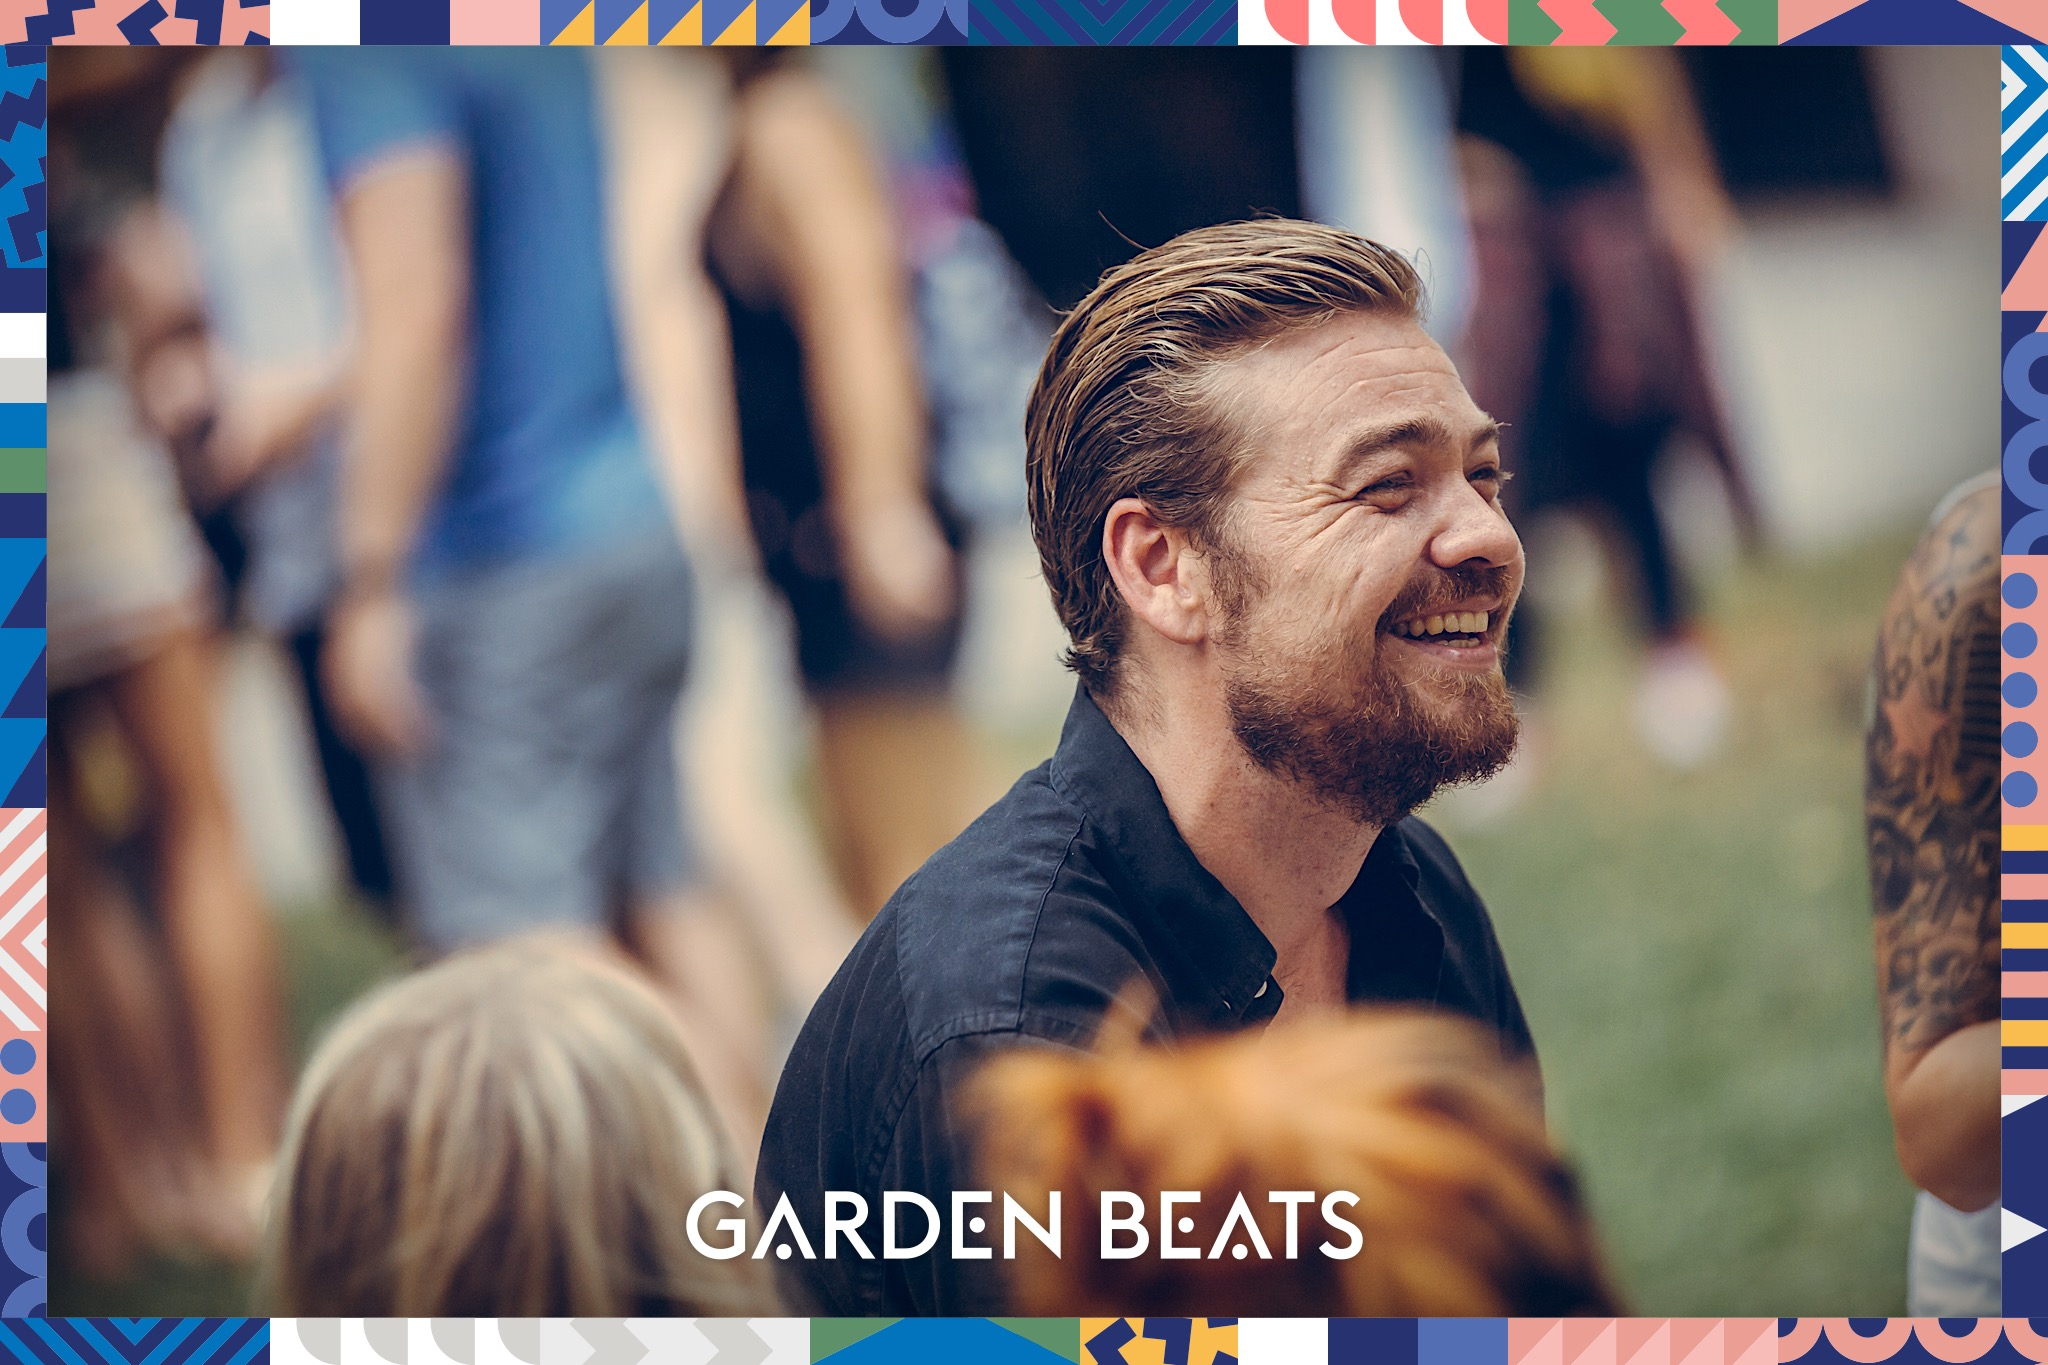 03032018_GardenBeats_Colossal361_Watermarked.jpg